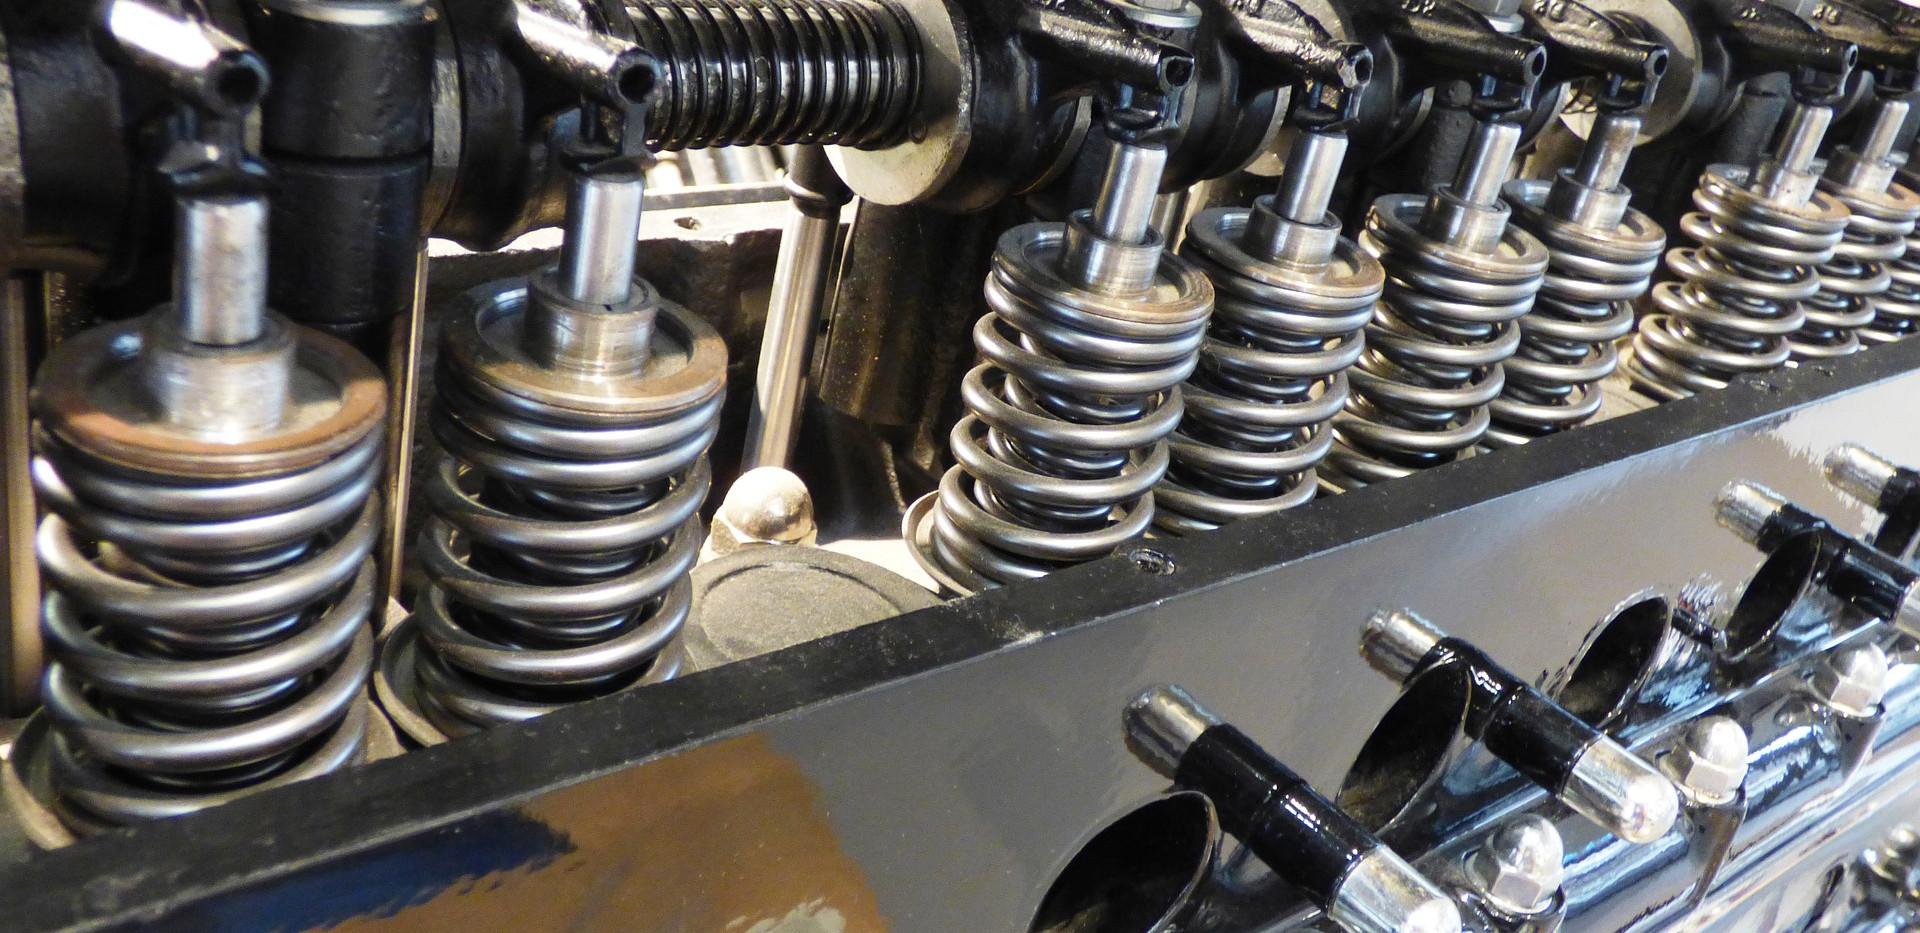 engine-1100580_1920.jpg